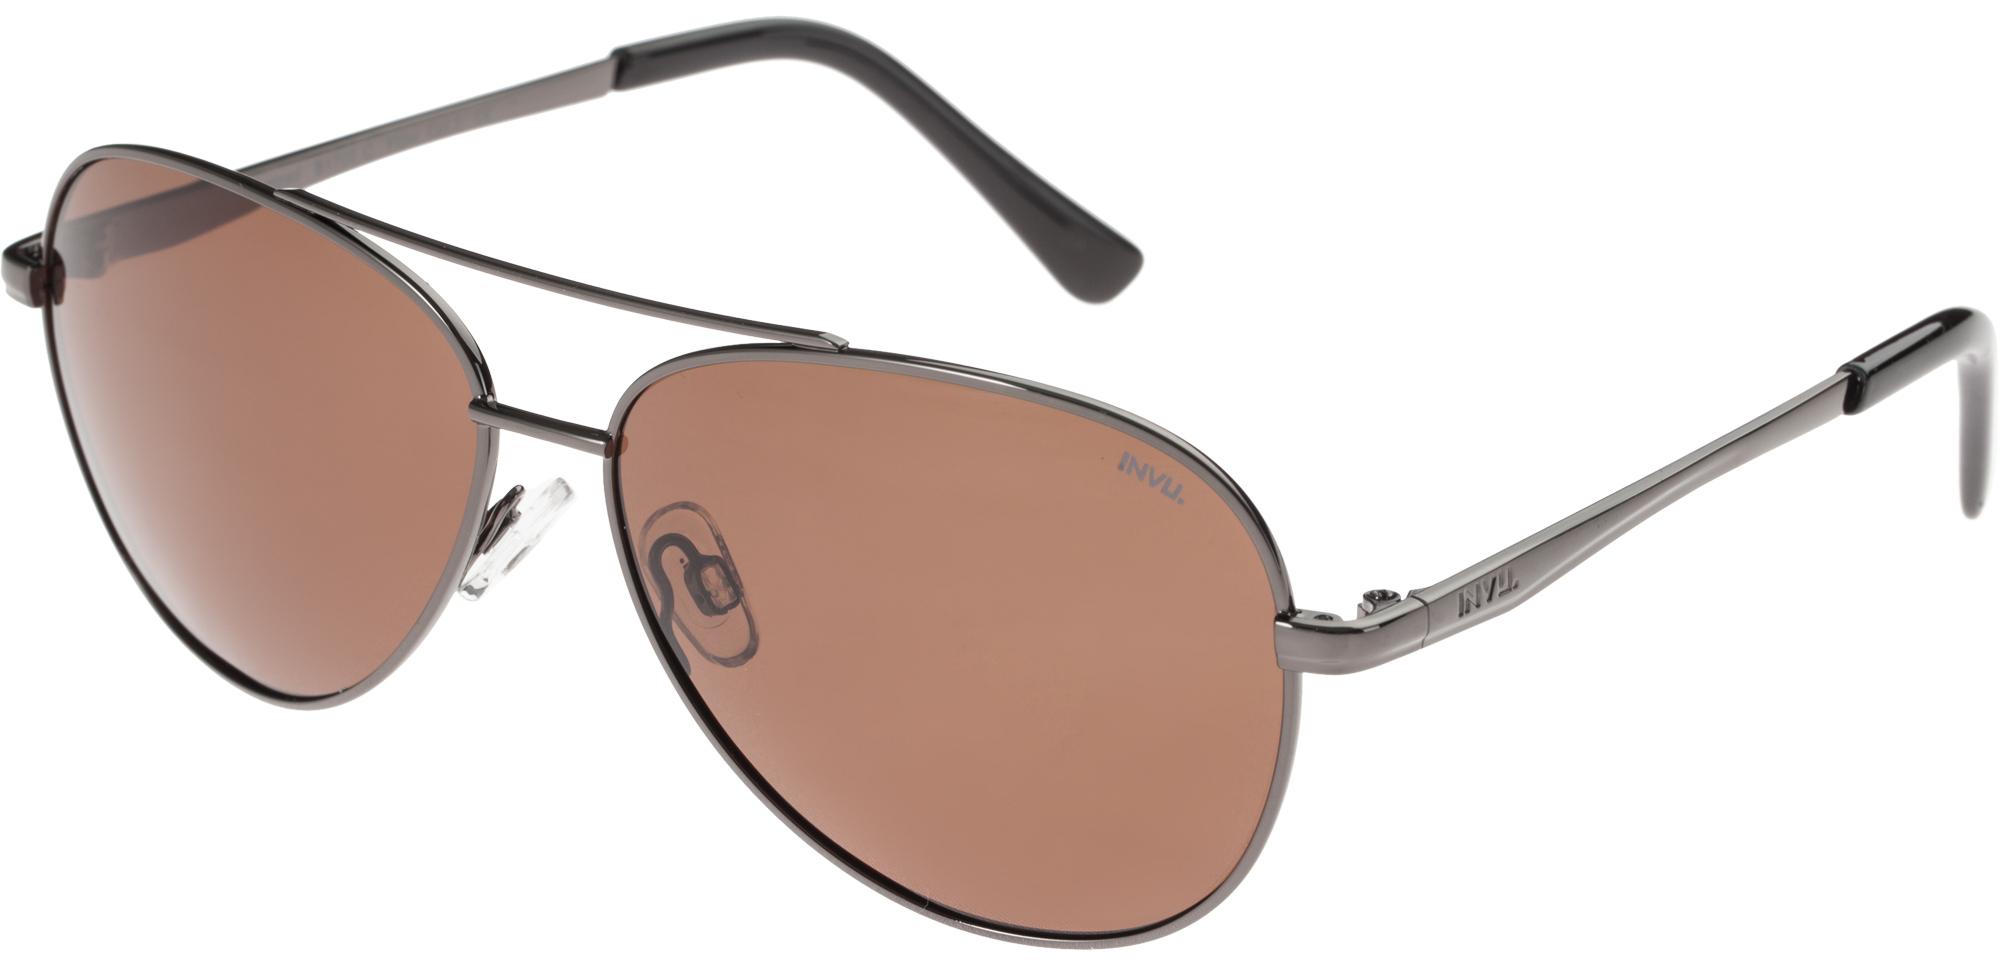 Invu Солнцезащитные очки мужские Invu солнцезащитные мужские очки уфа